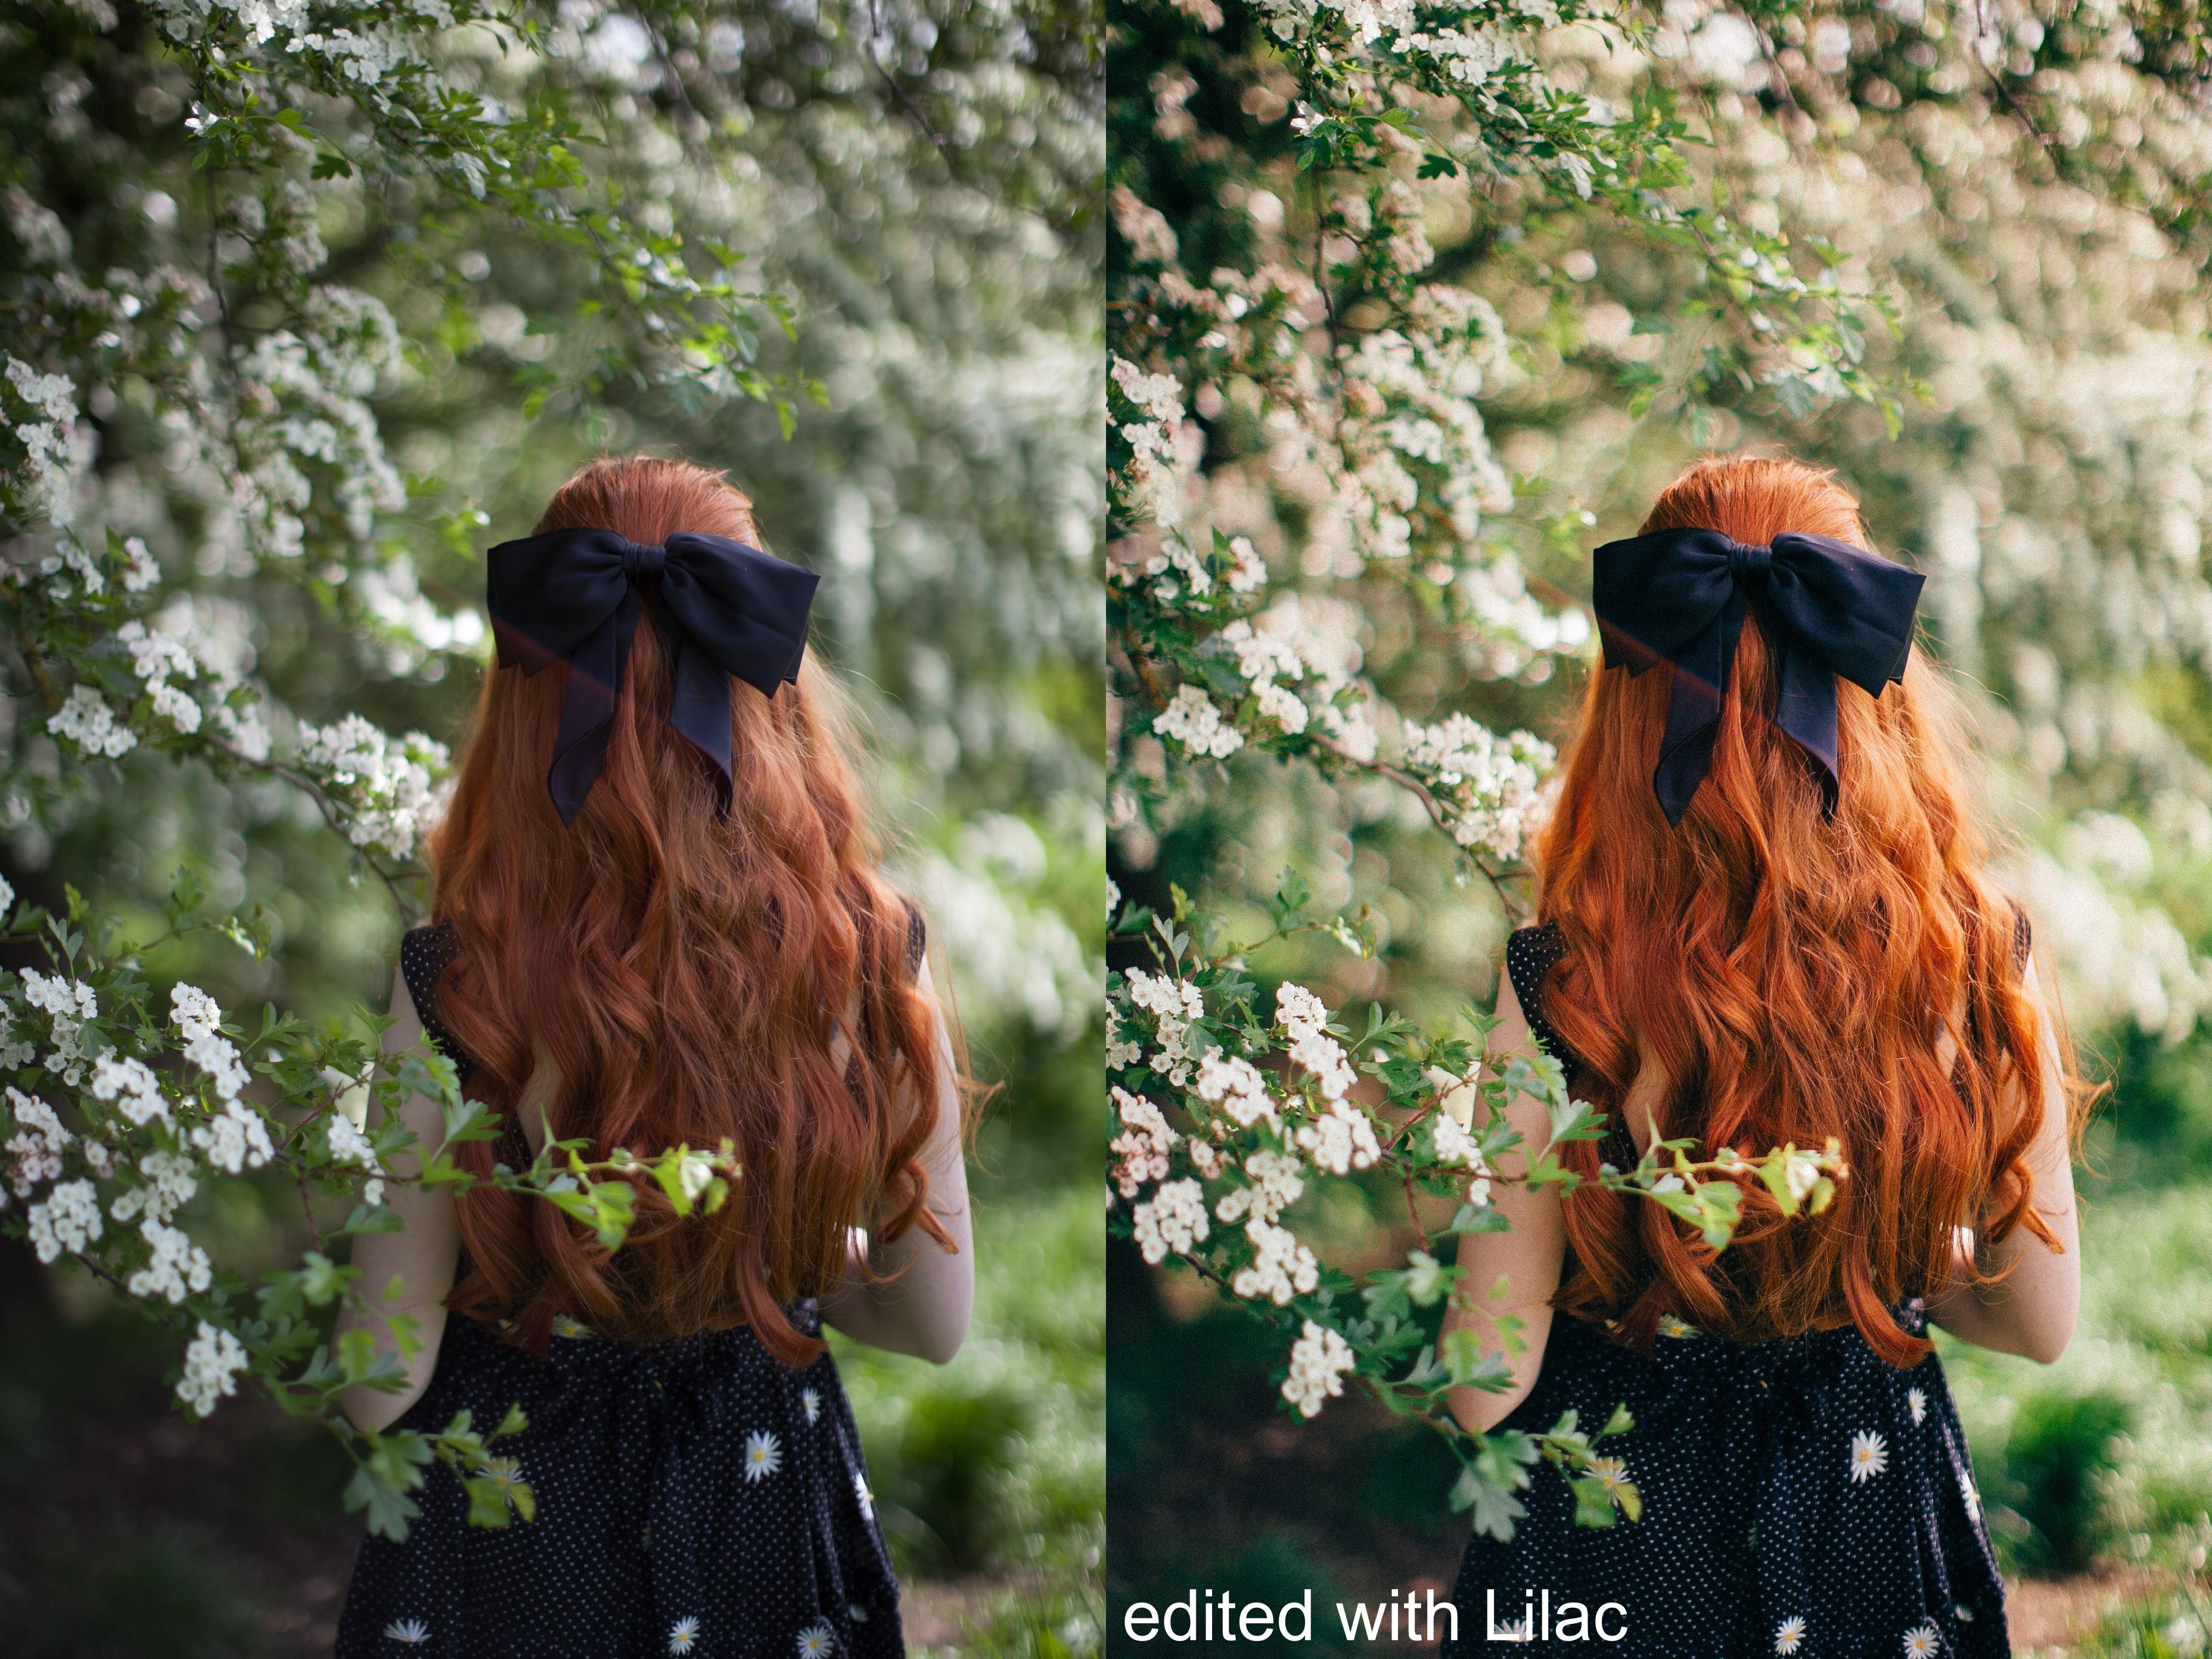 lilac edit